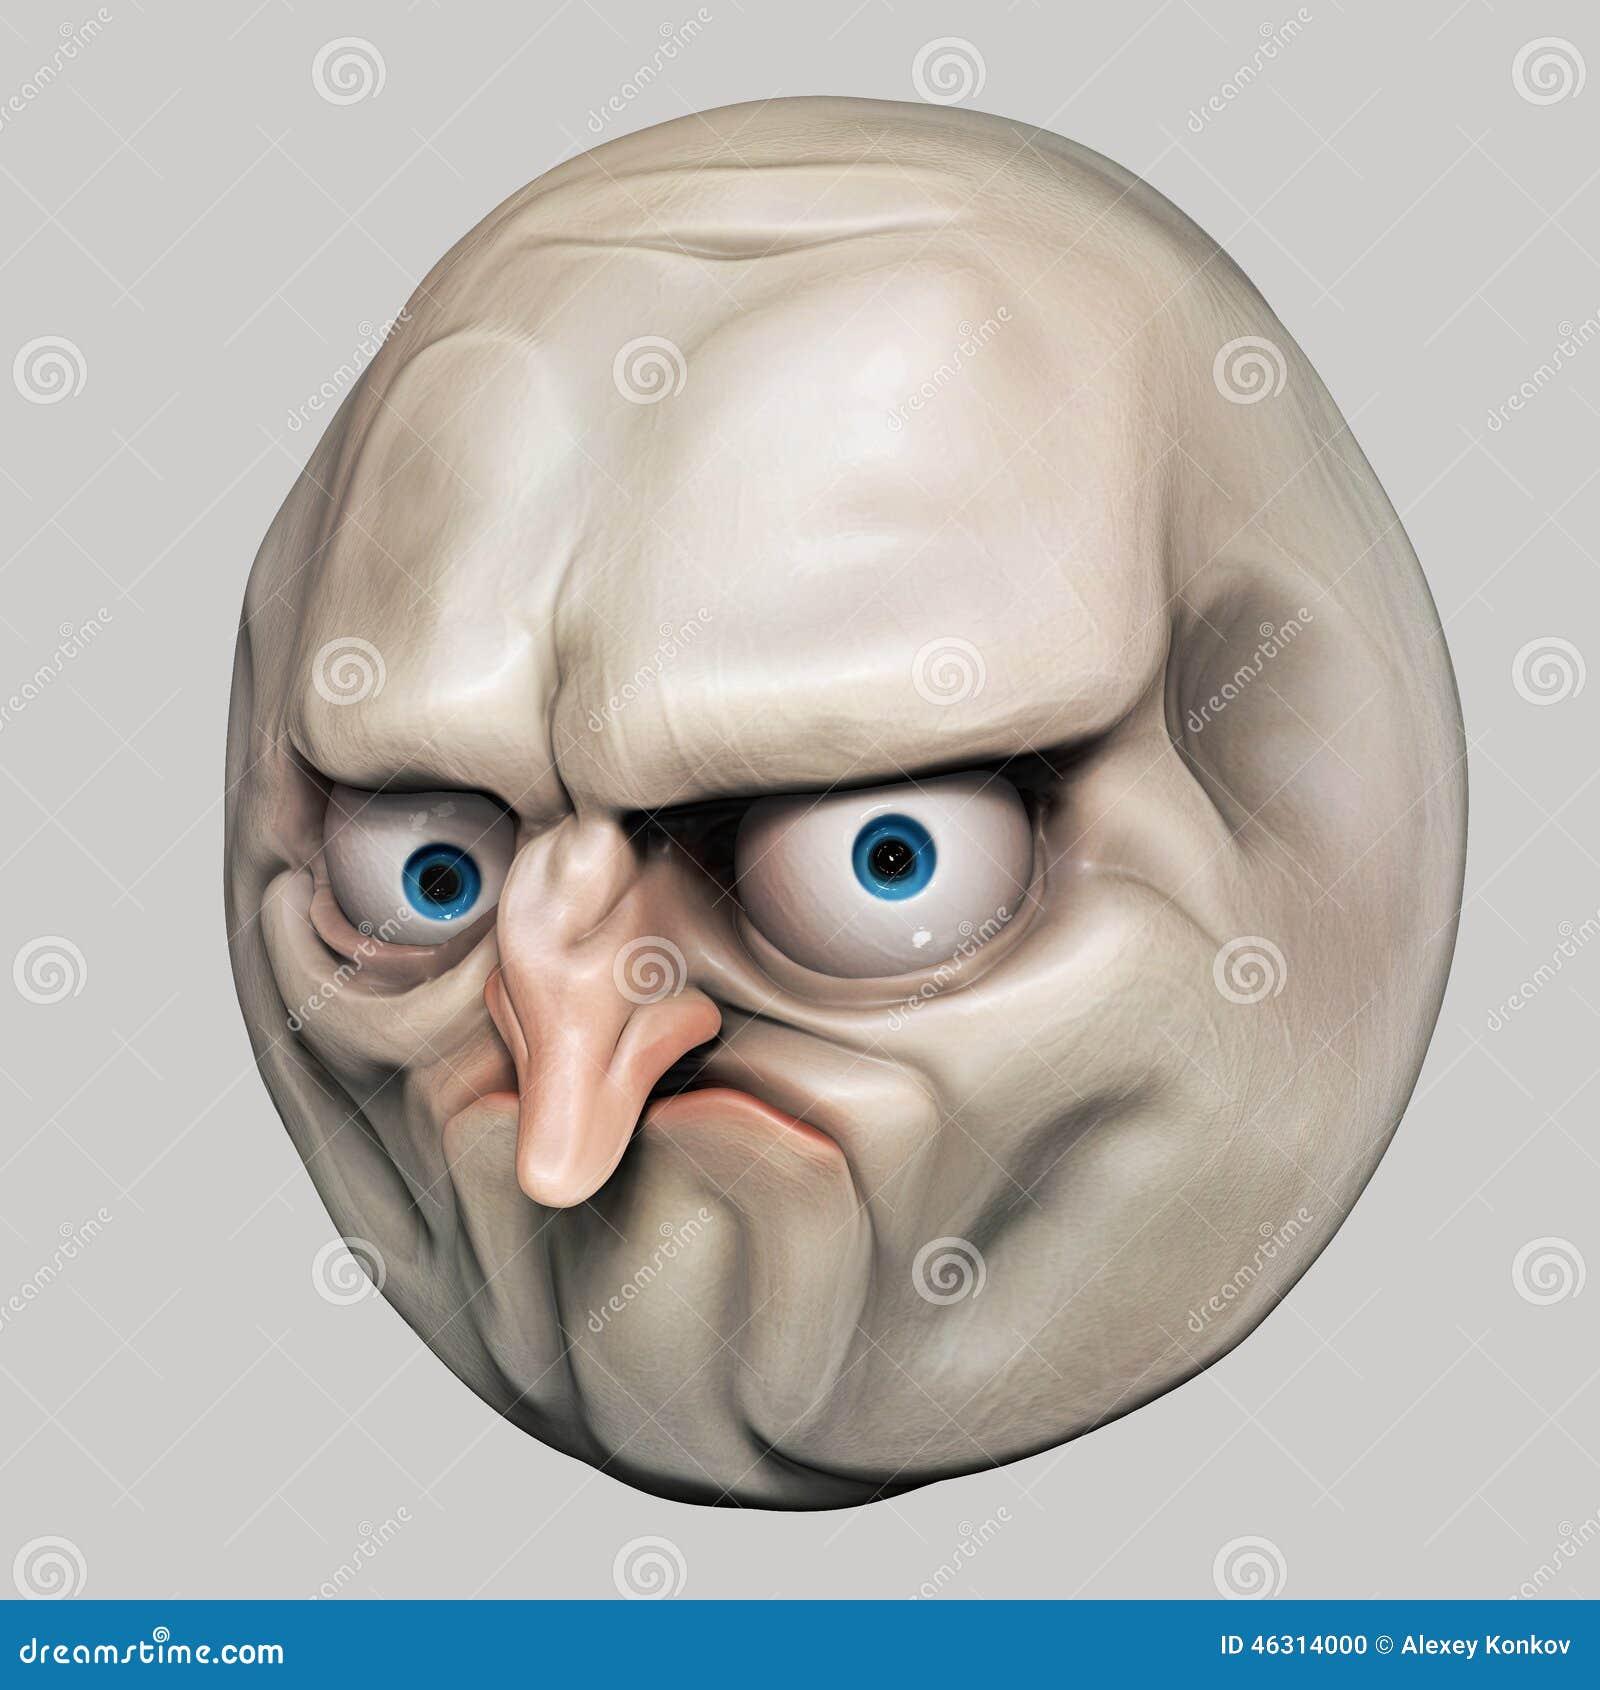 Internet Meme No Rage Face 3d Illustration Stock